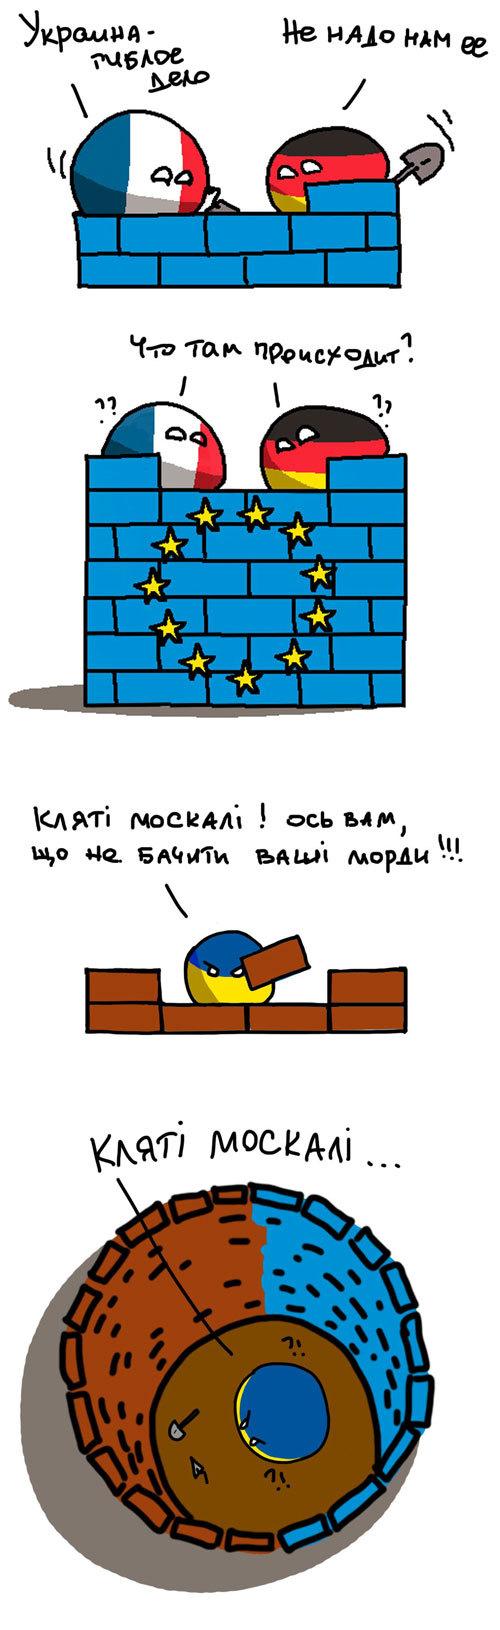 Украина. Скоро... Украина, политика, countryballs, длиннопост